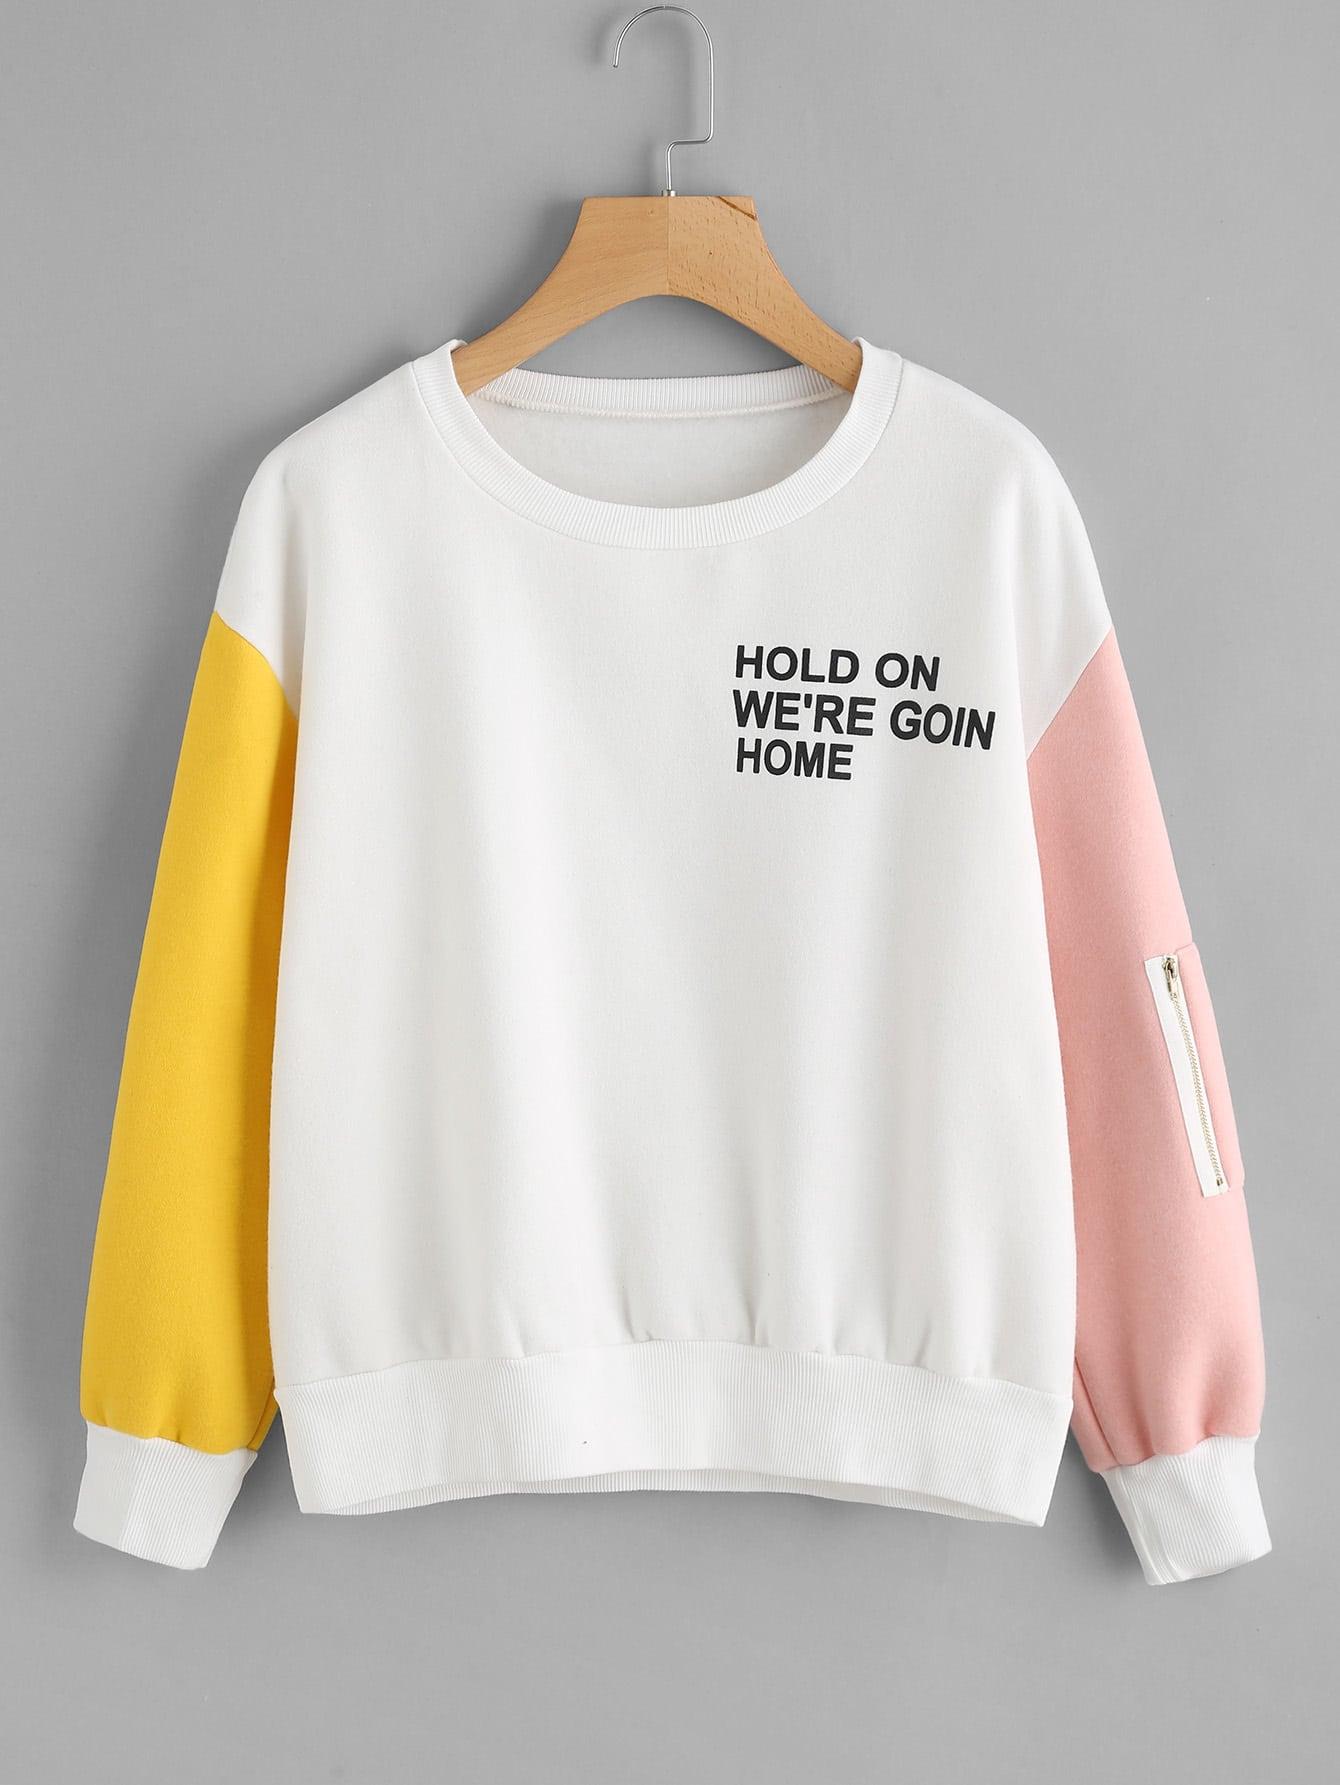 Contrast Sleeve Slogan Print Sweatshirt